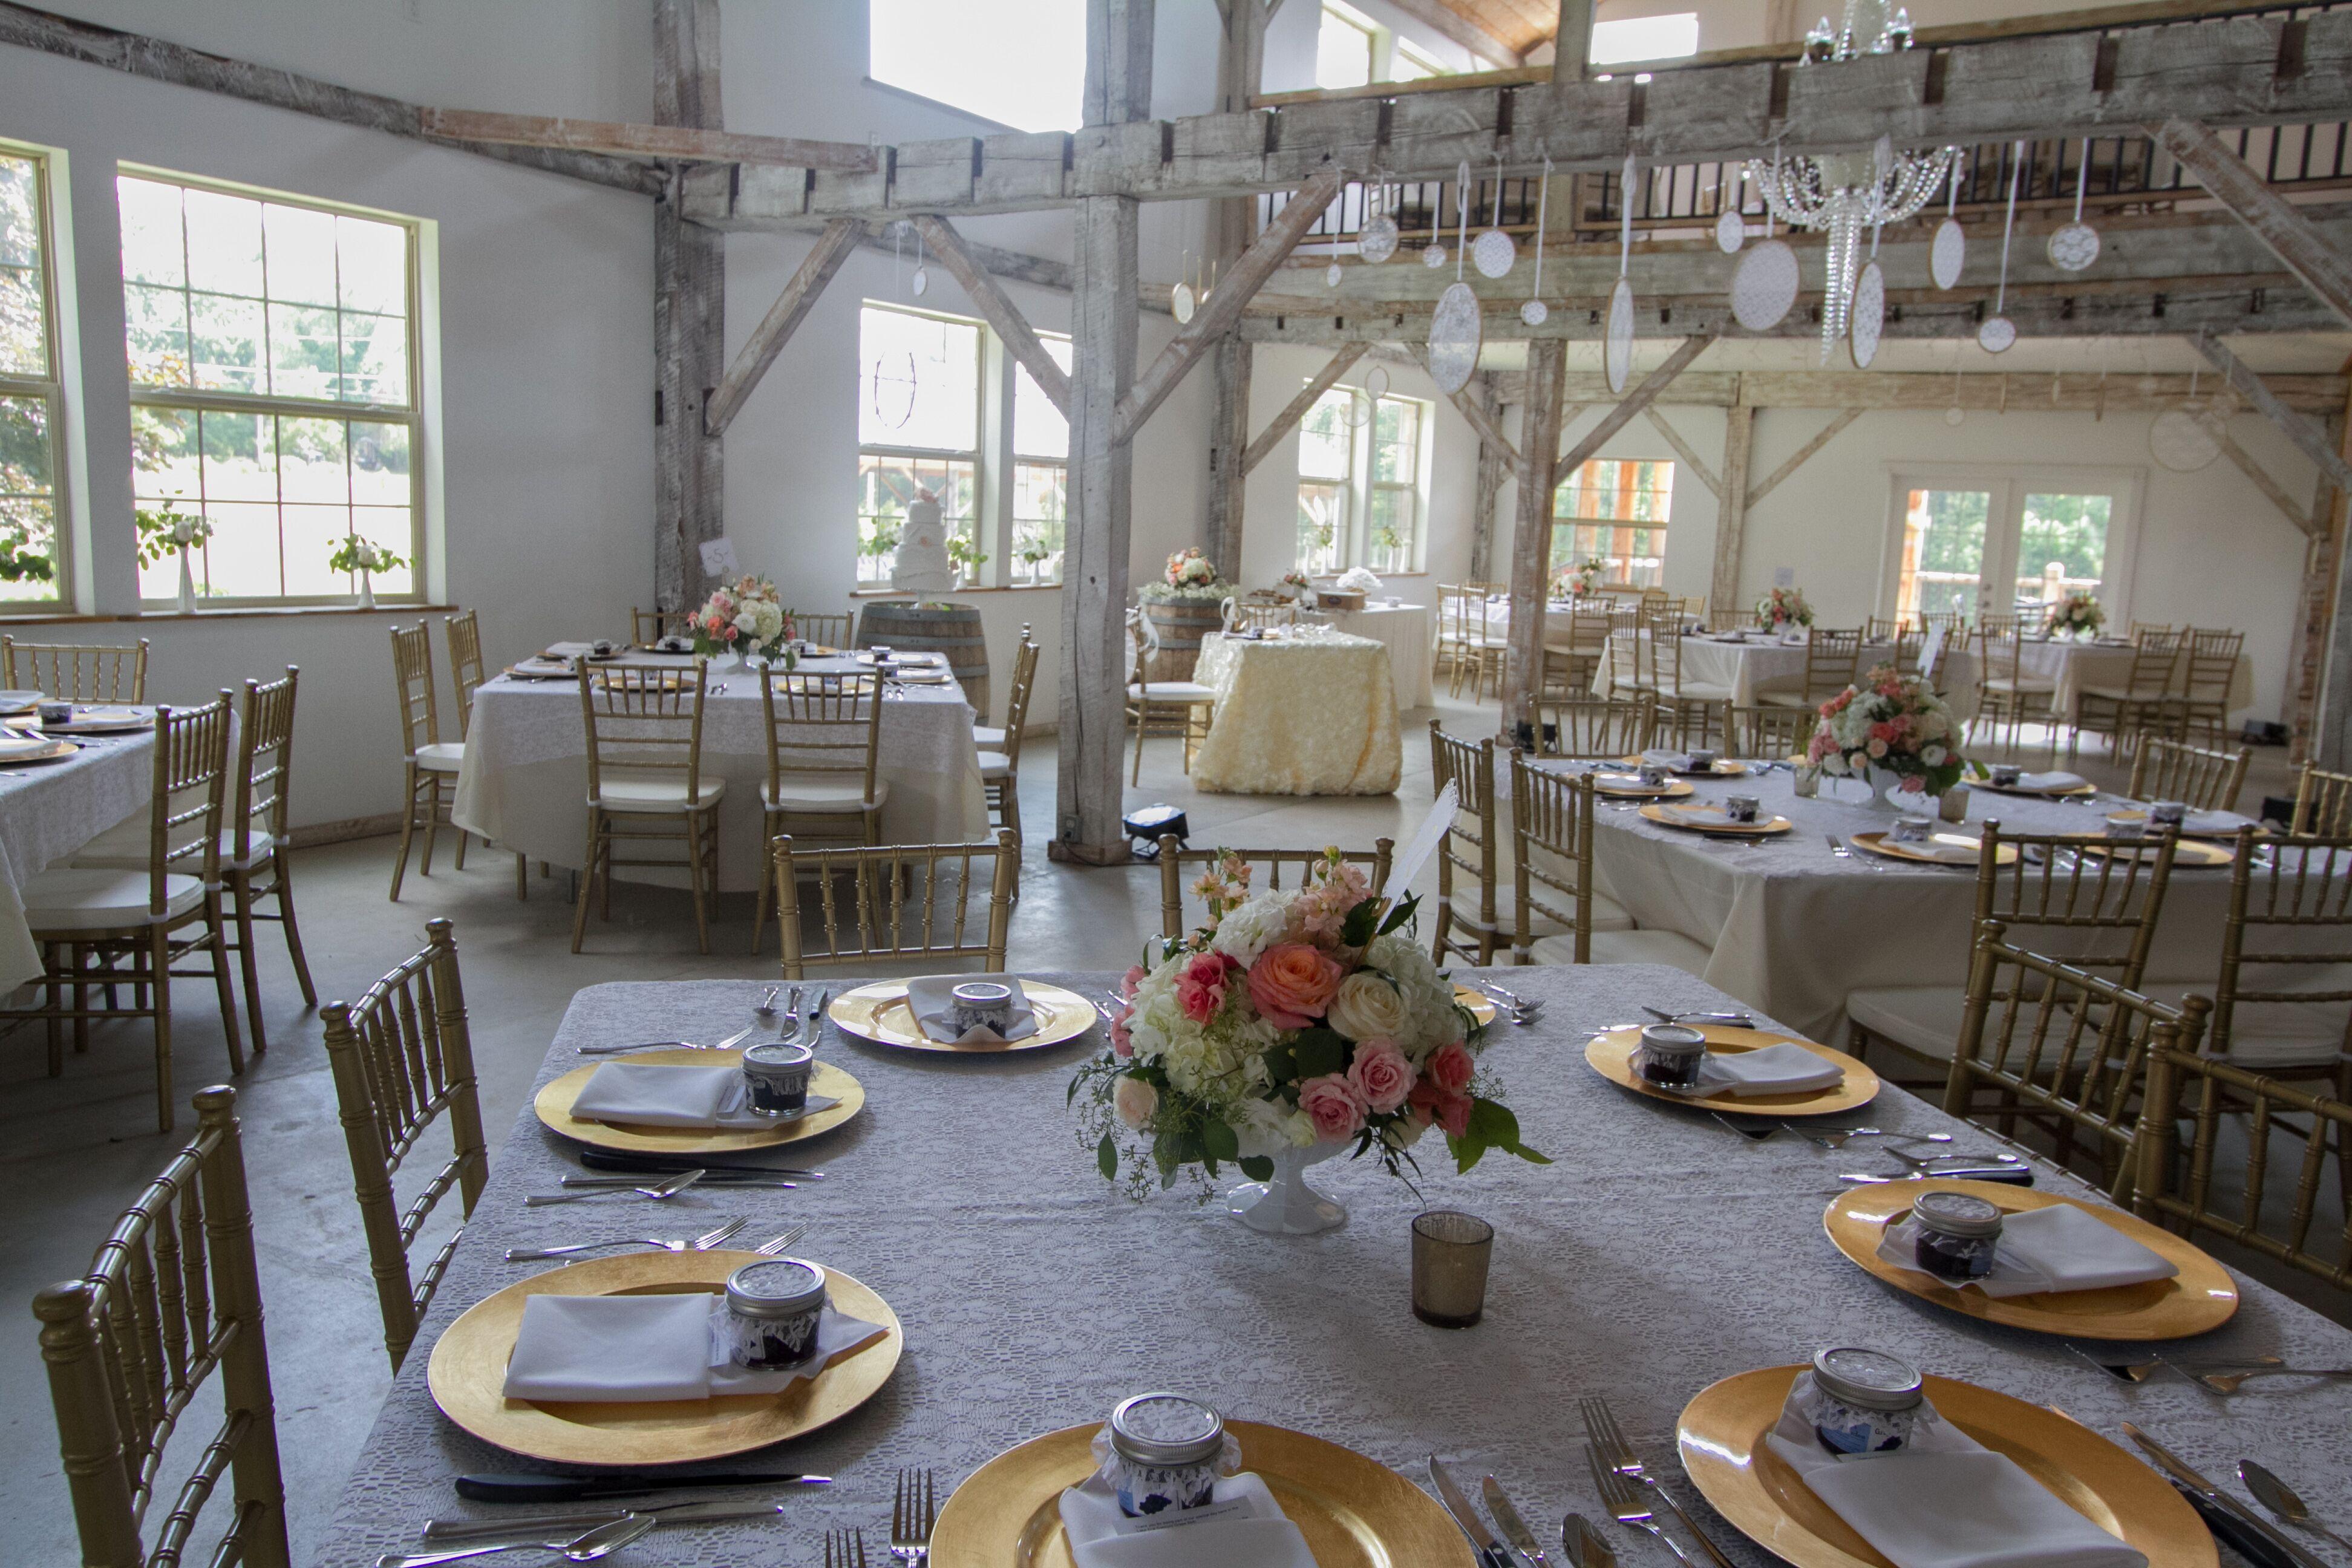 Quincy Cellars Winery Barn Reception